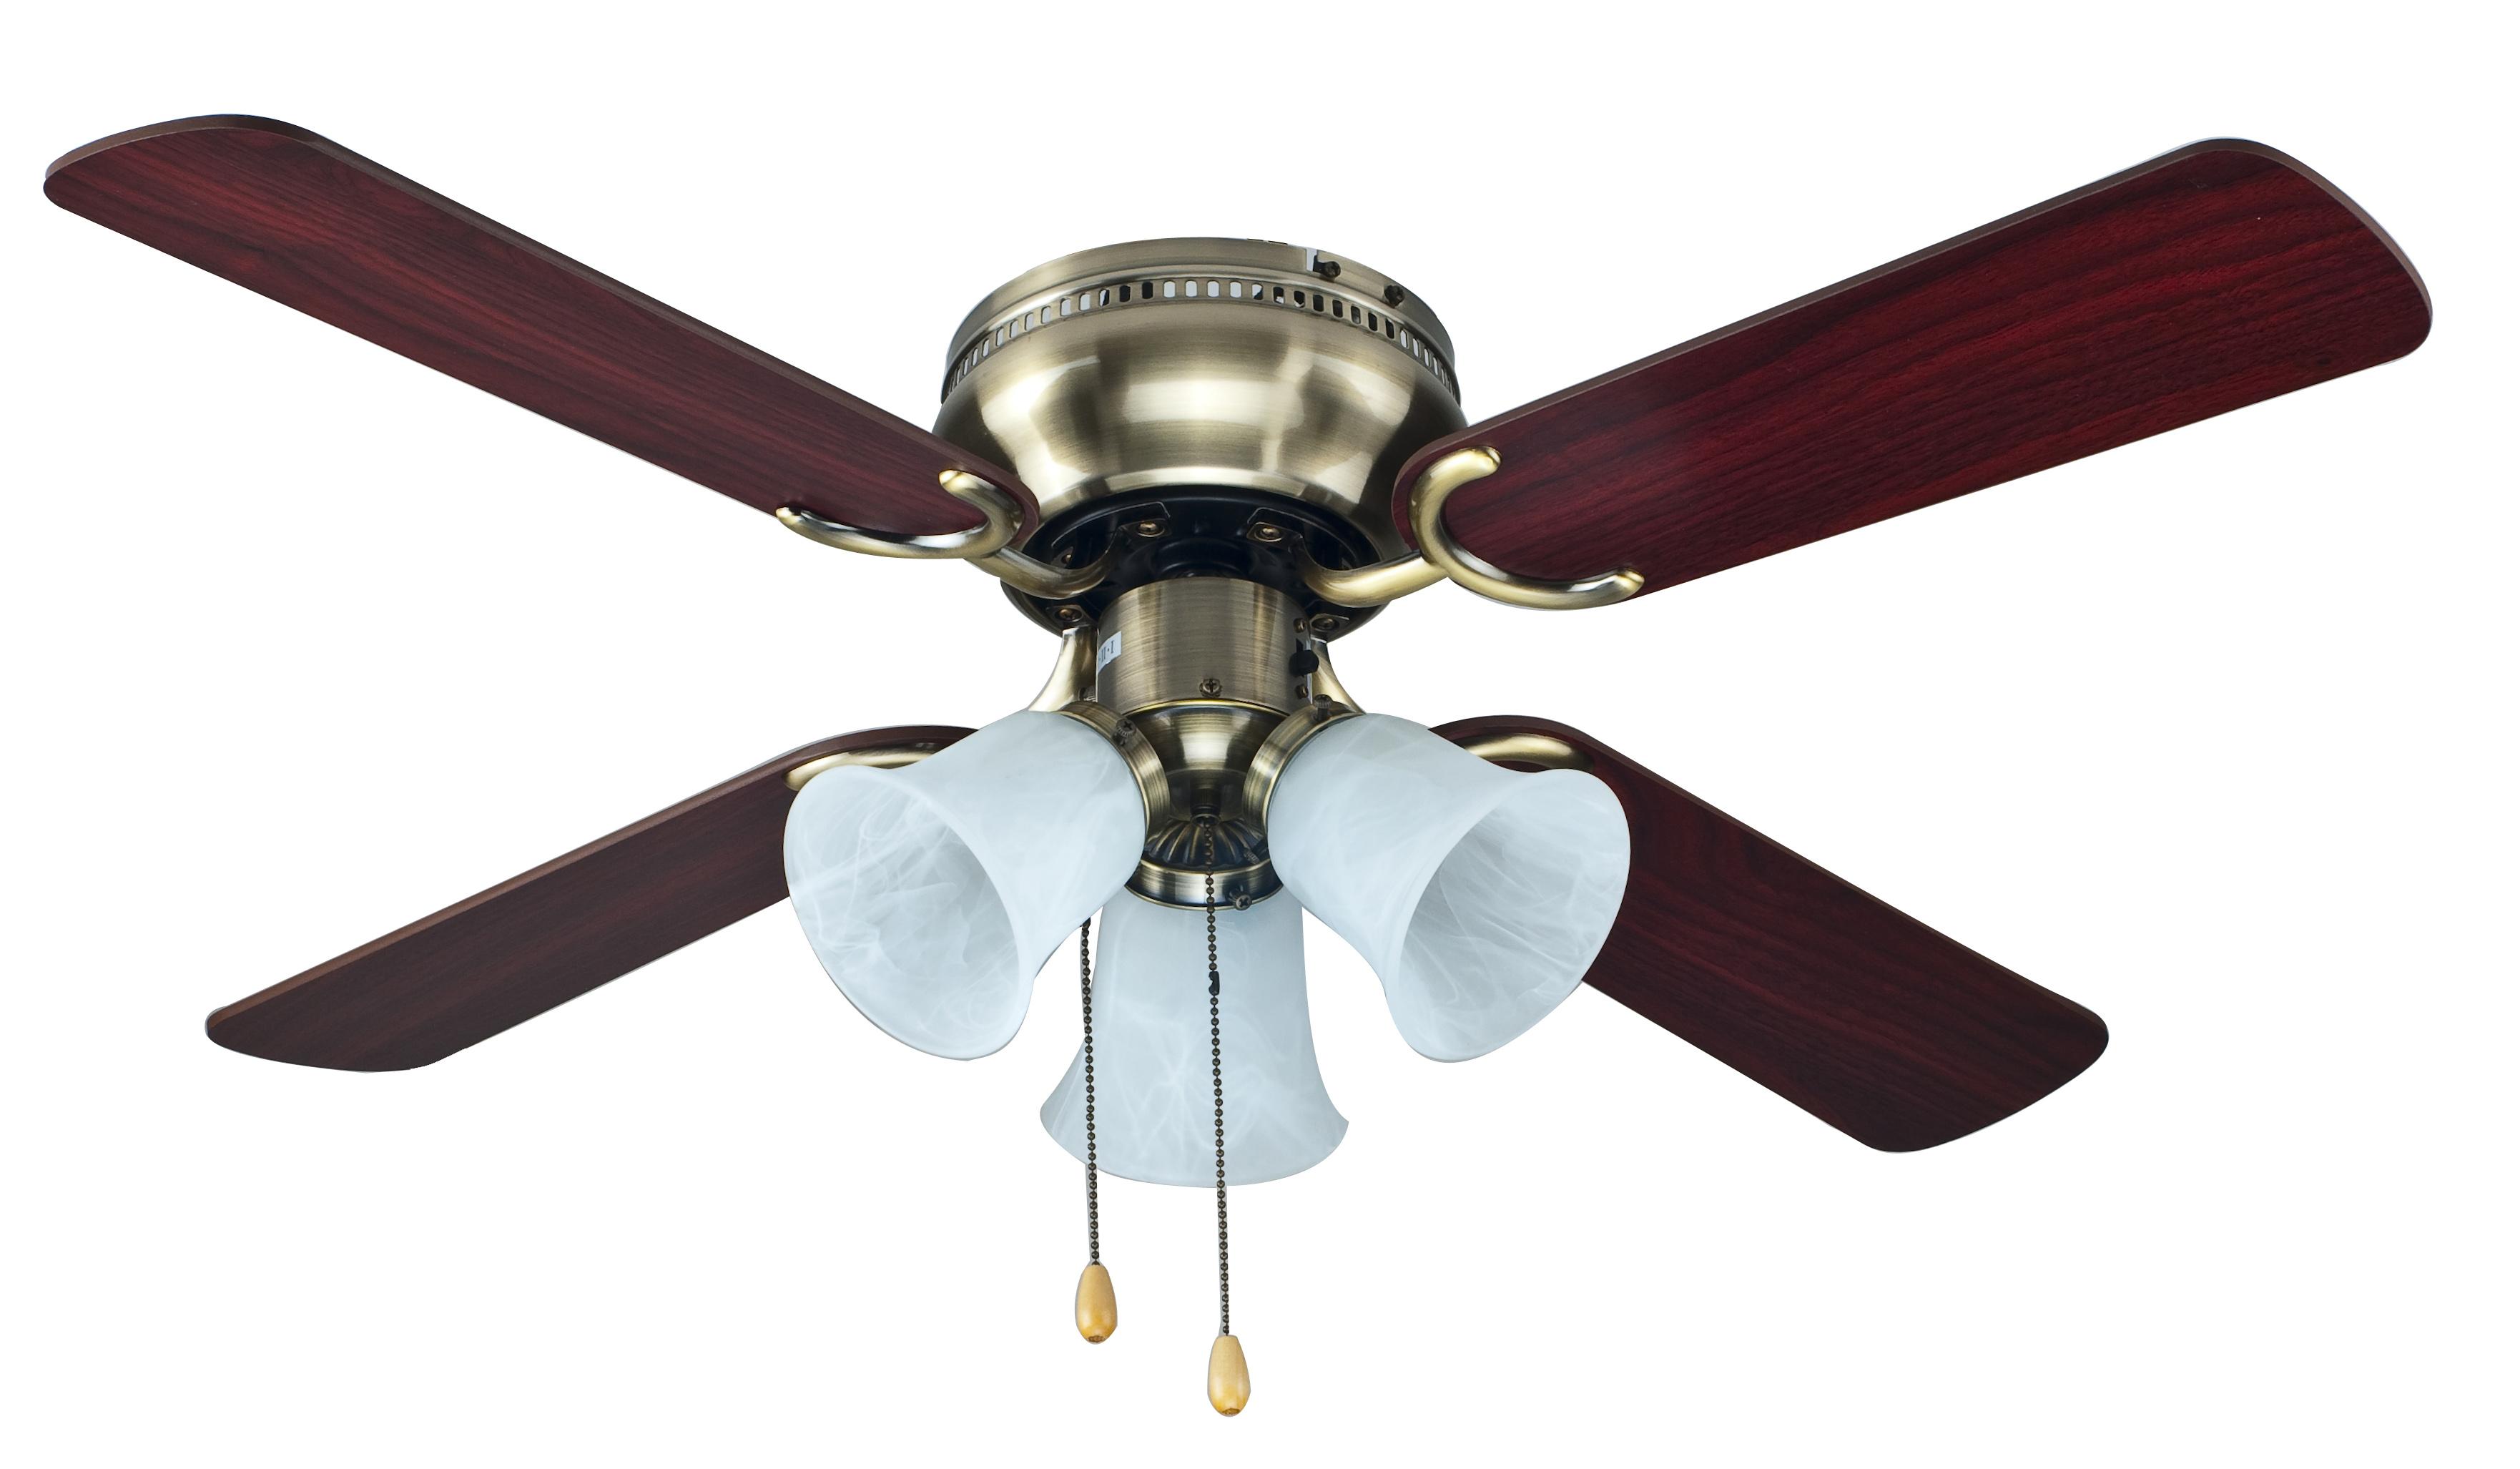 cool~breeze 42in bronze ceiling fan - appliances - fans - ceiling fans ZSVBPST